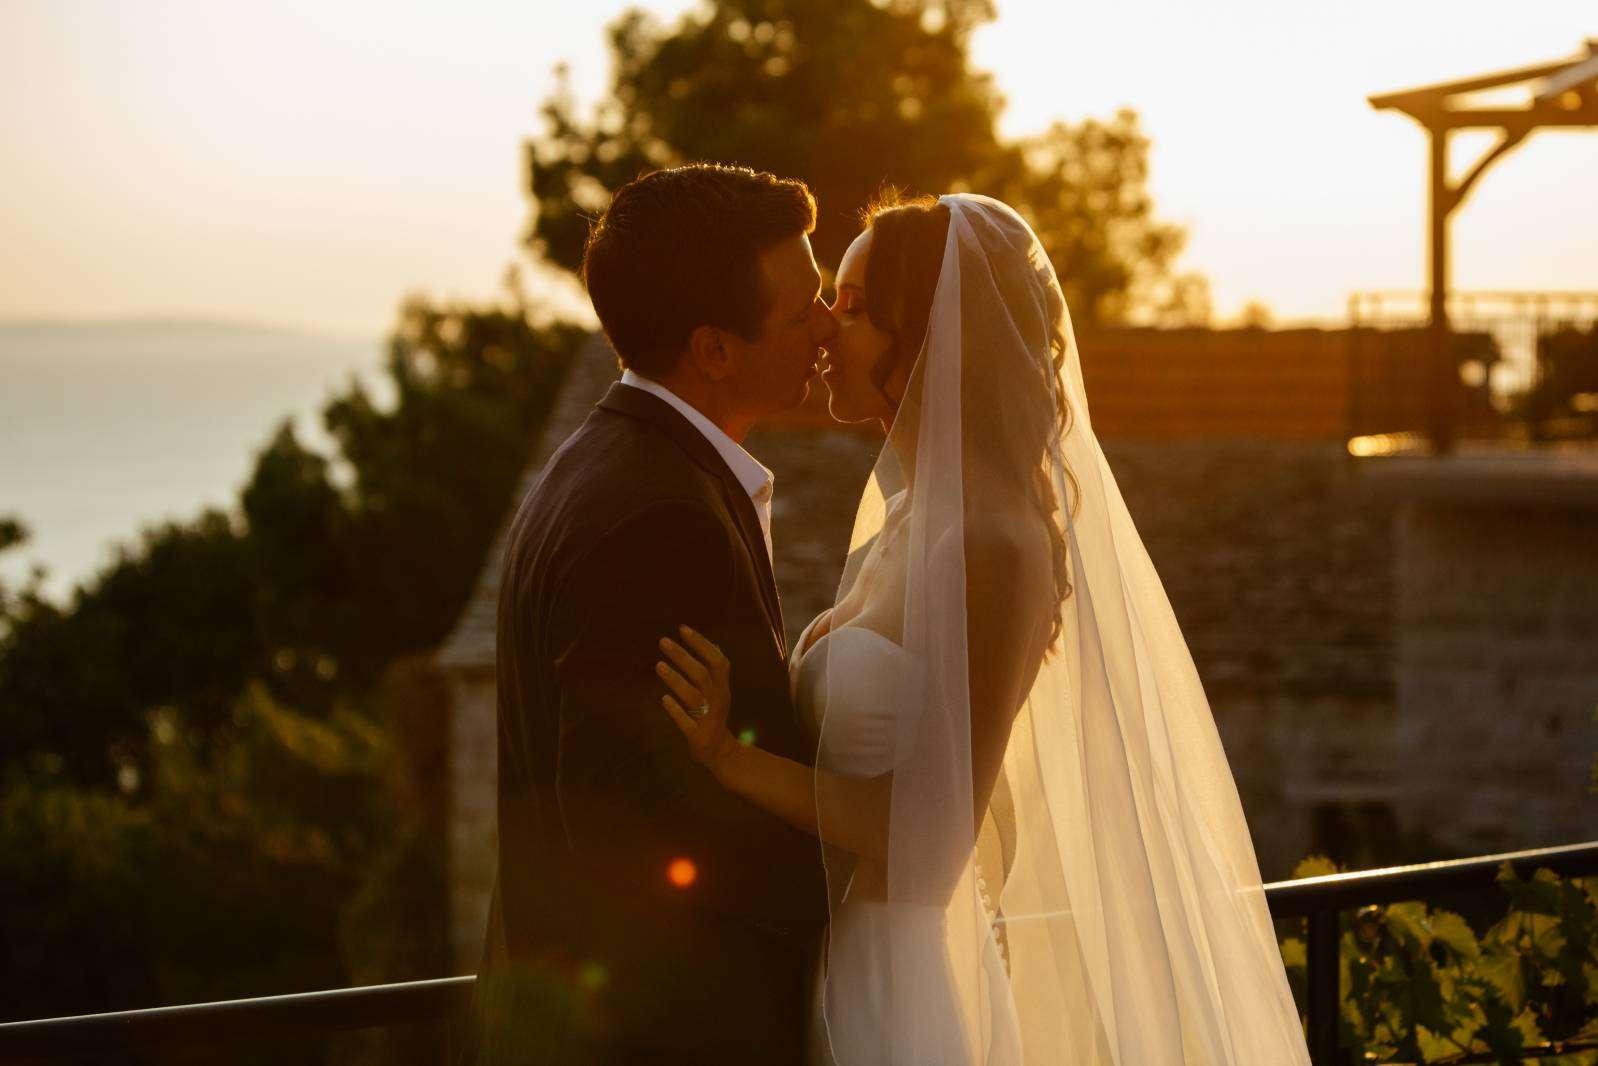 konoba bajso, wedding in croatia